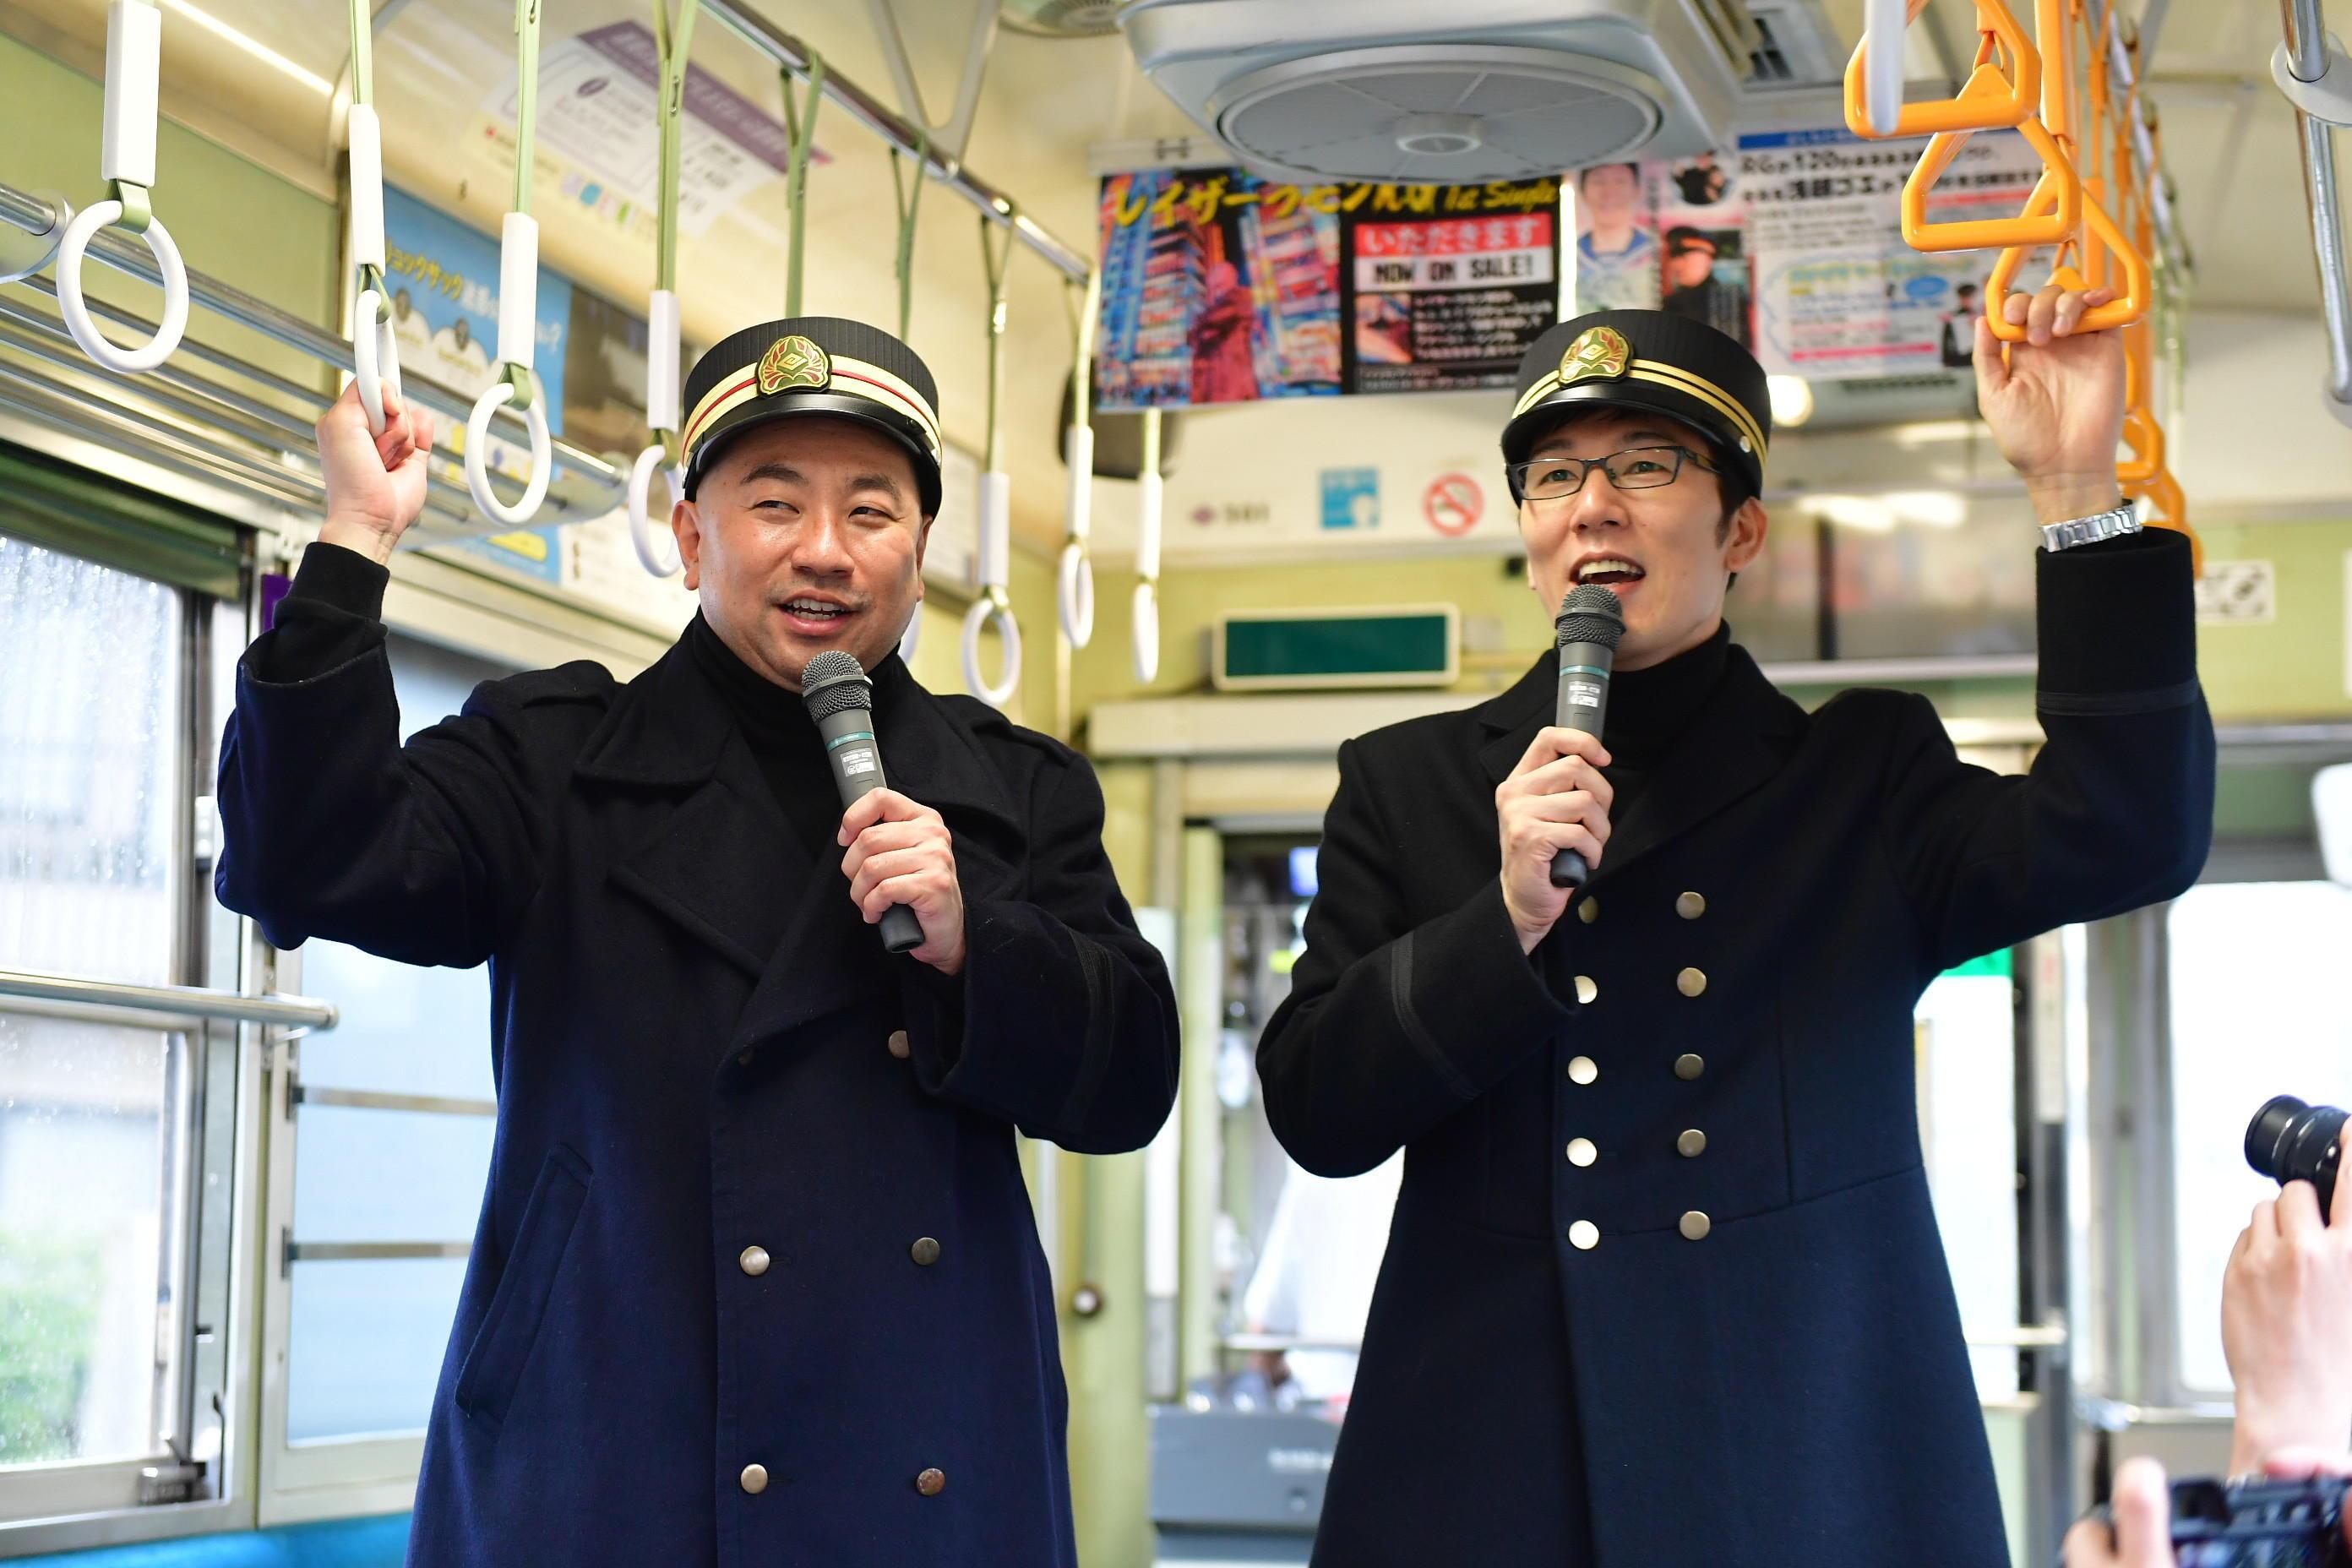 http://news.yoshimoto.co.jp/20180706213805-3de4e5eff426649c81600d72ec883f294c7c90c0.jpg